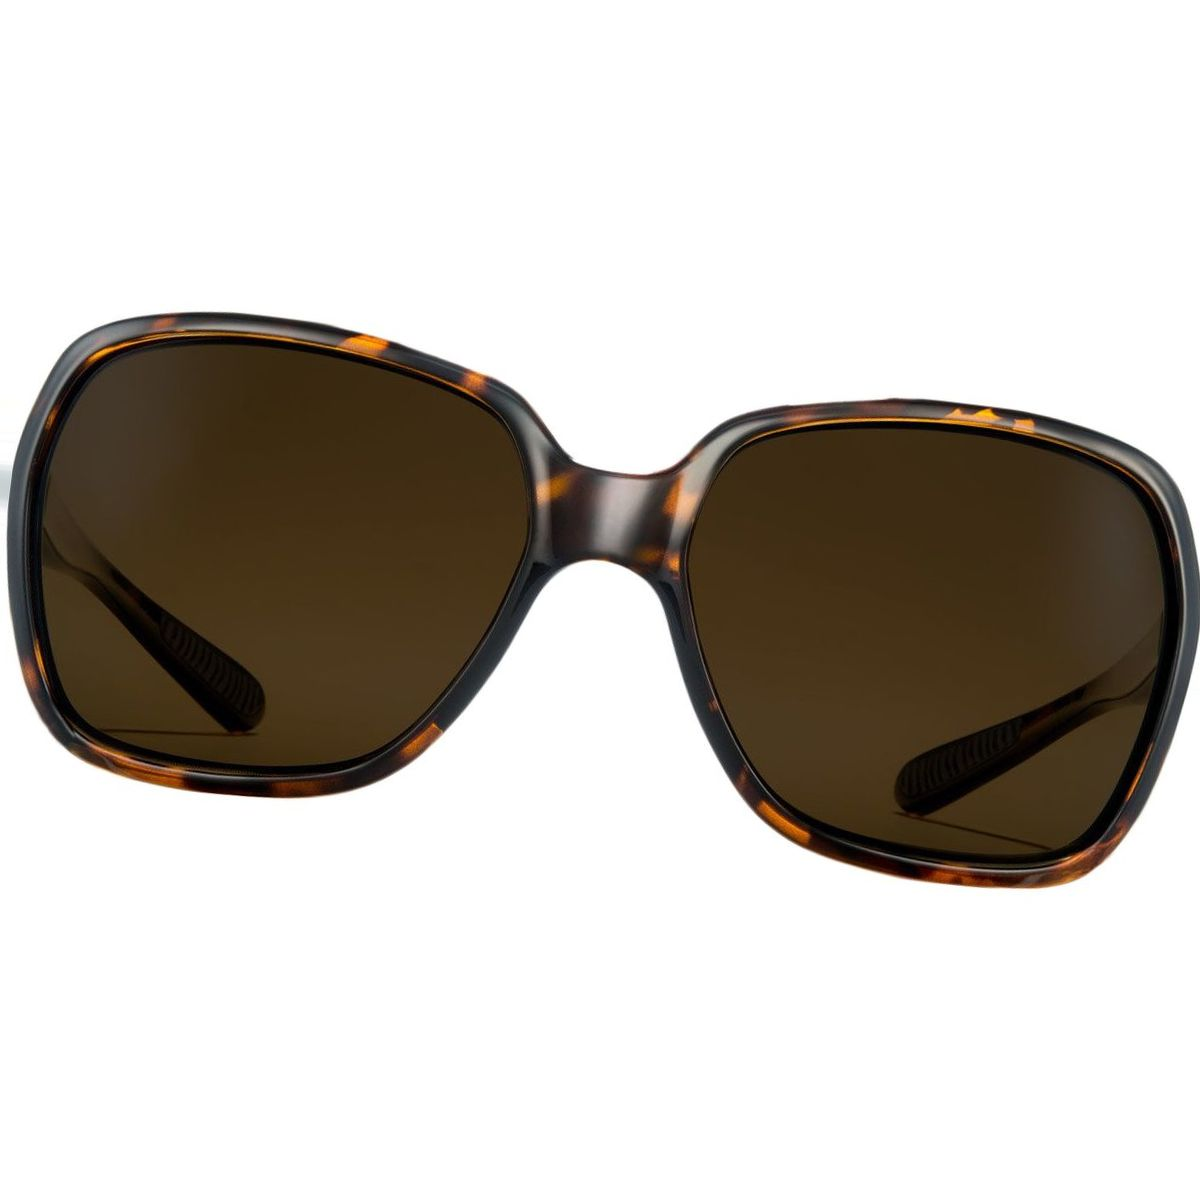 Roka Monaco Sunglasses - Women's